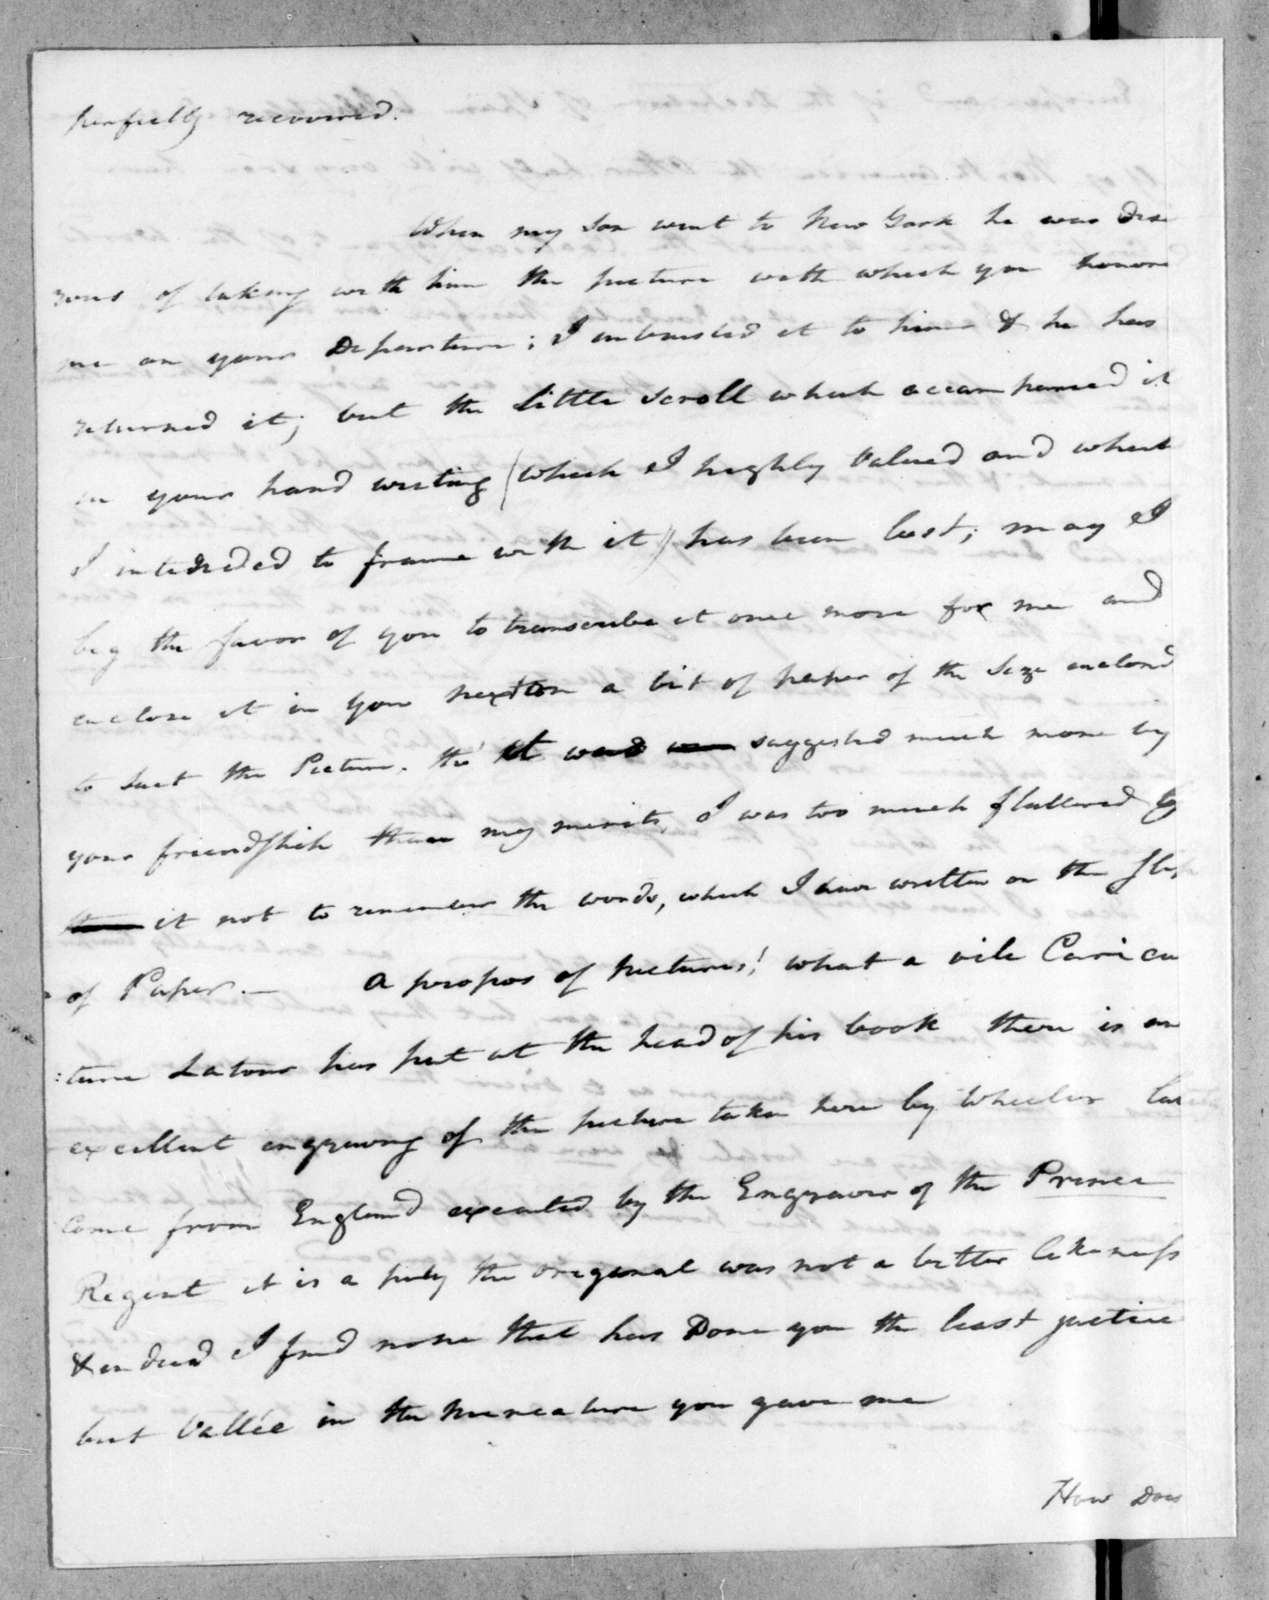 Edward Livingston to Andrew Jackson, November 7, 1816